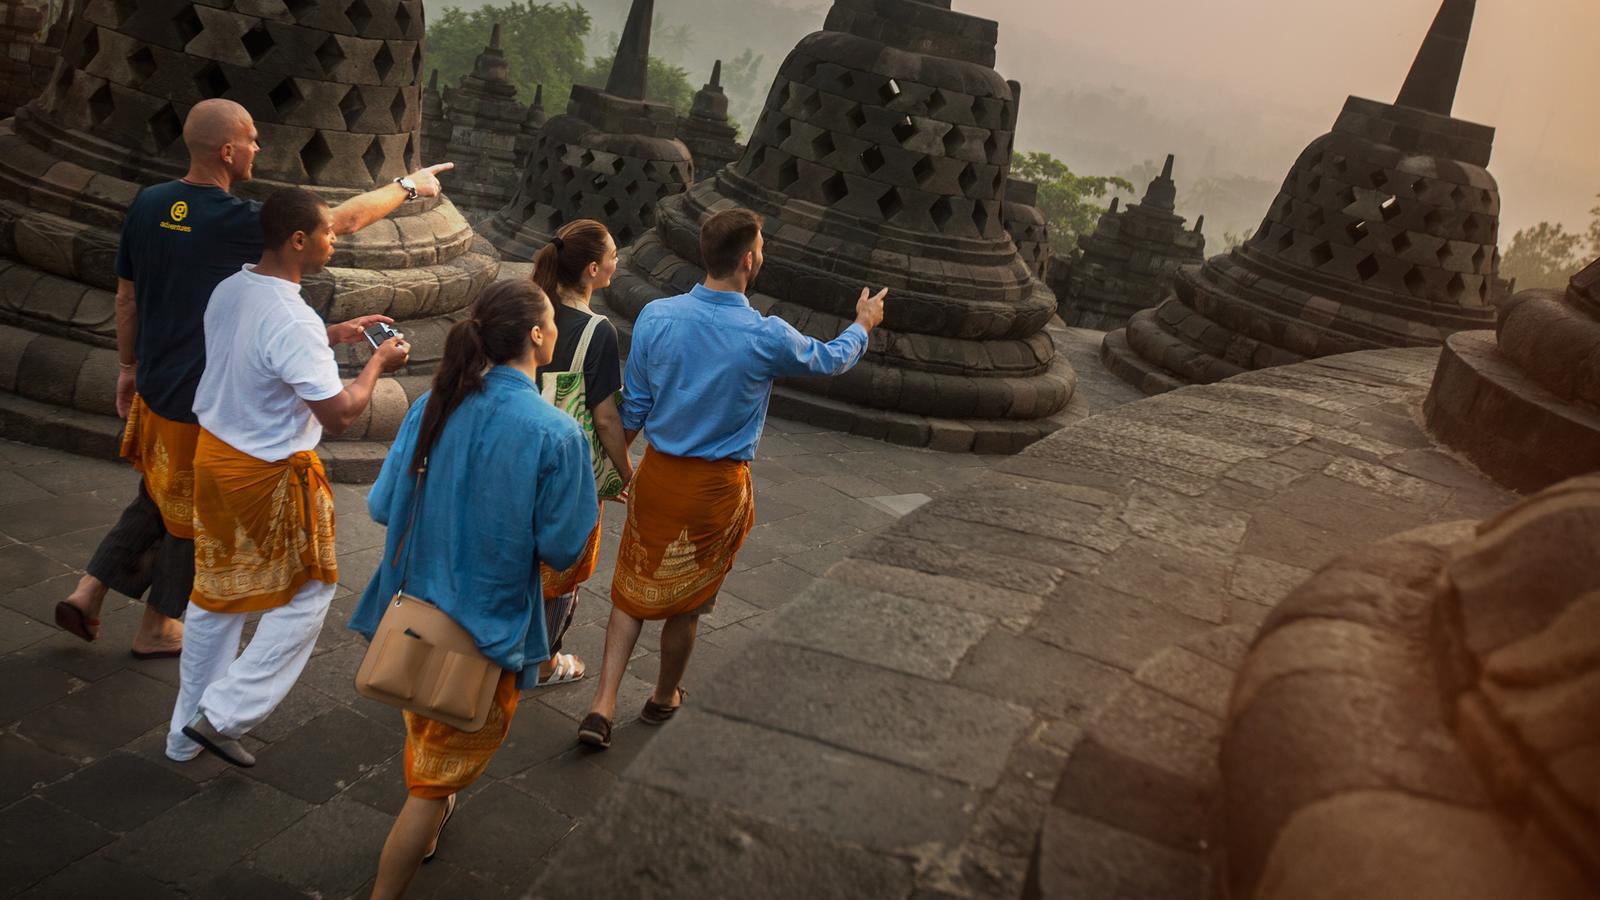 traveljunkies Java Bali Indonesie Jakarta Ubud Borobudur Abenteuerreise Erlebnisreise Gruppenreise Adventure Reisen für junge Leute